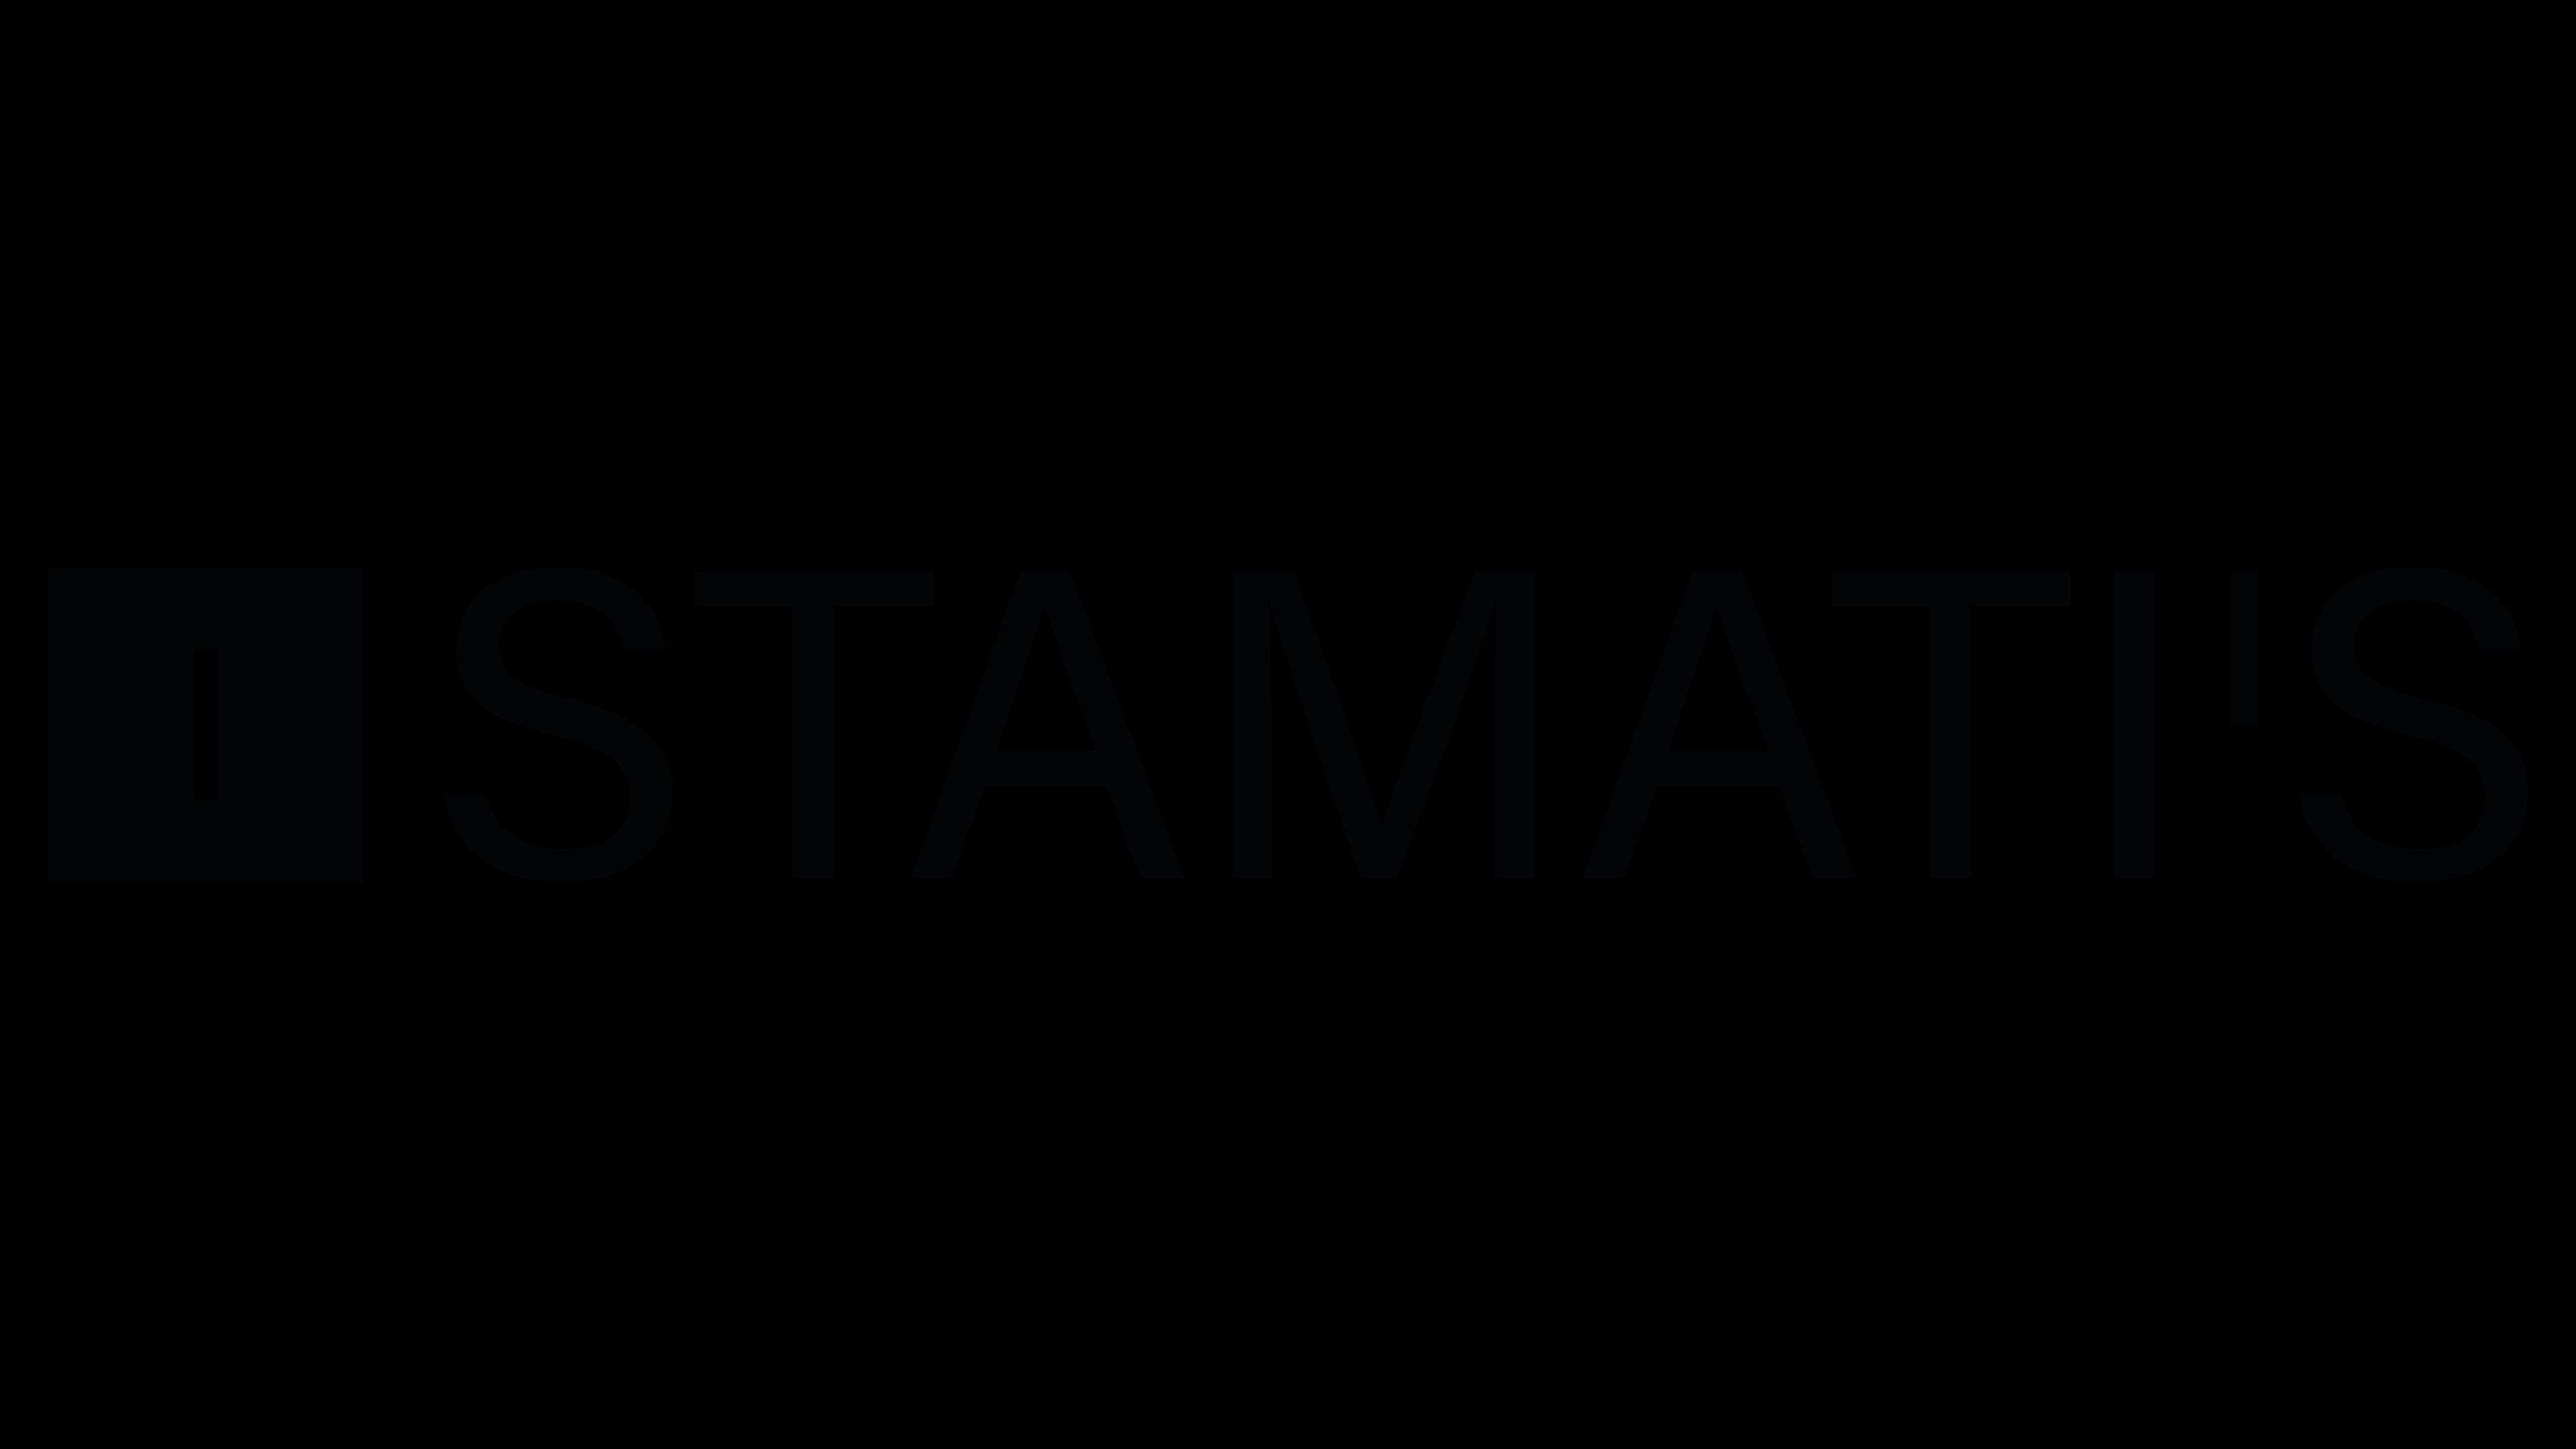 Stamati's